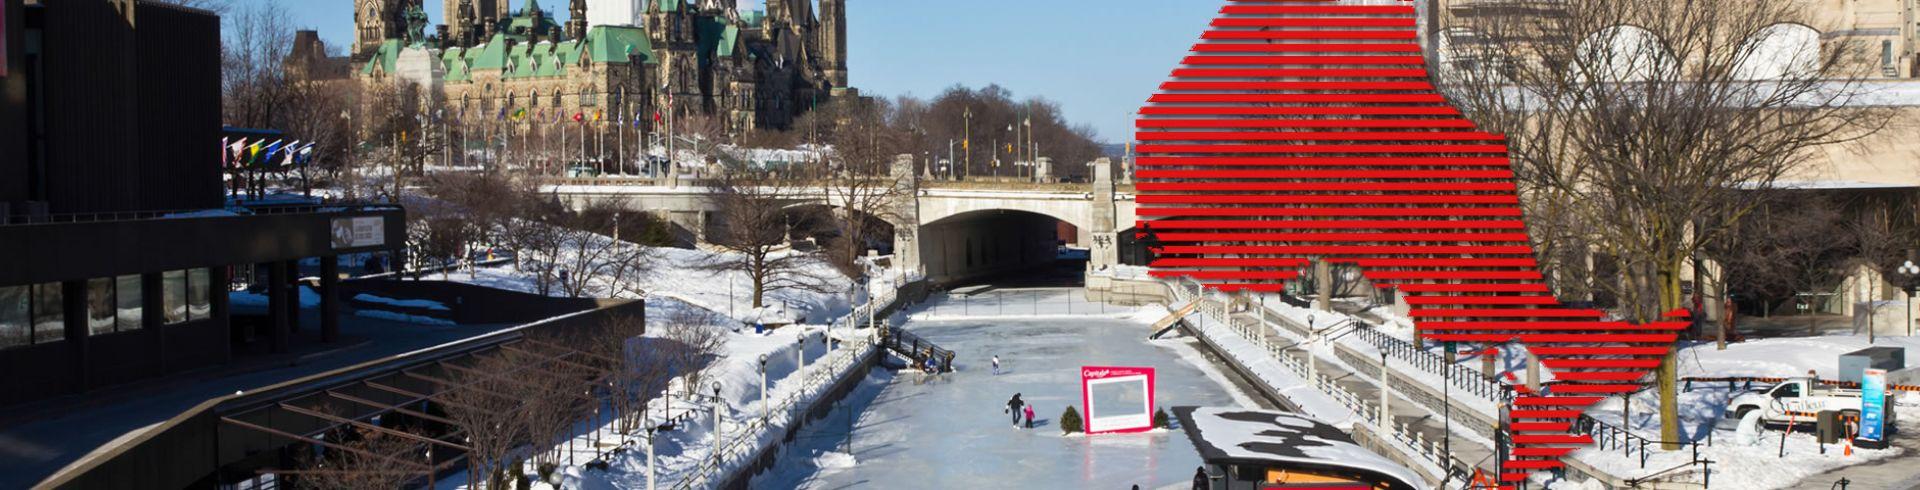 Programs - Rideau canal Ottawa